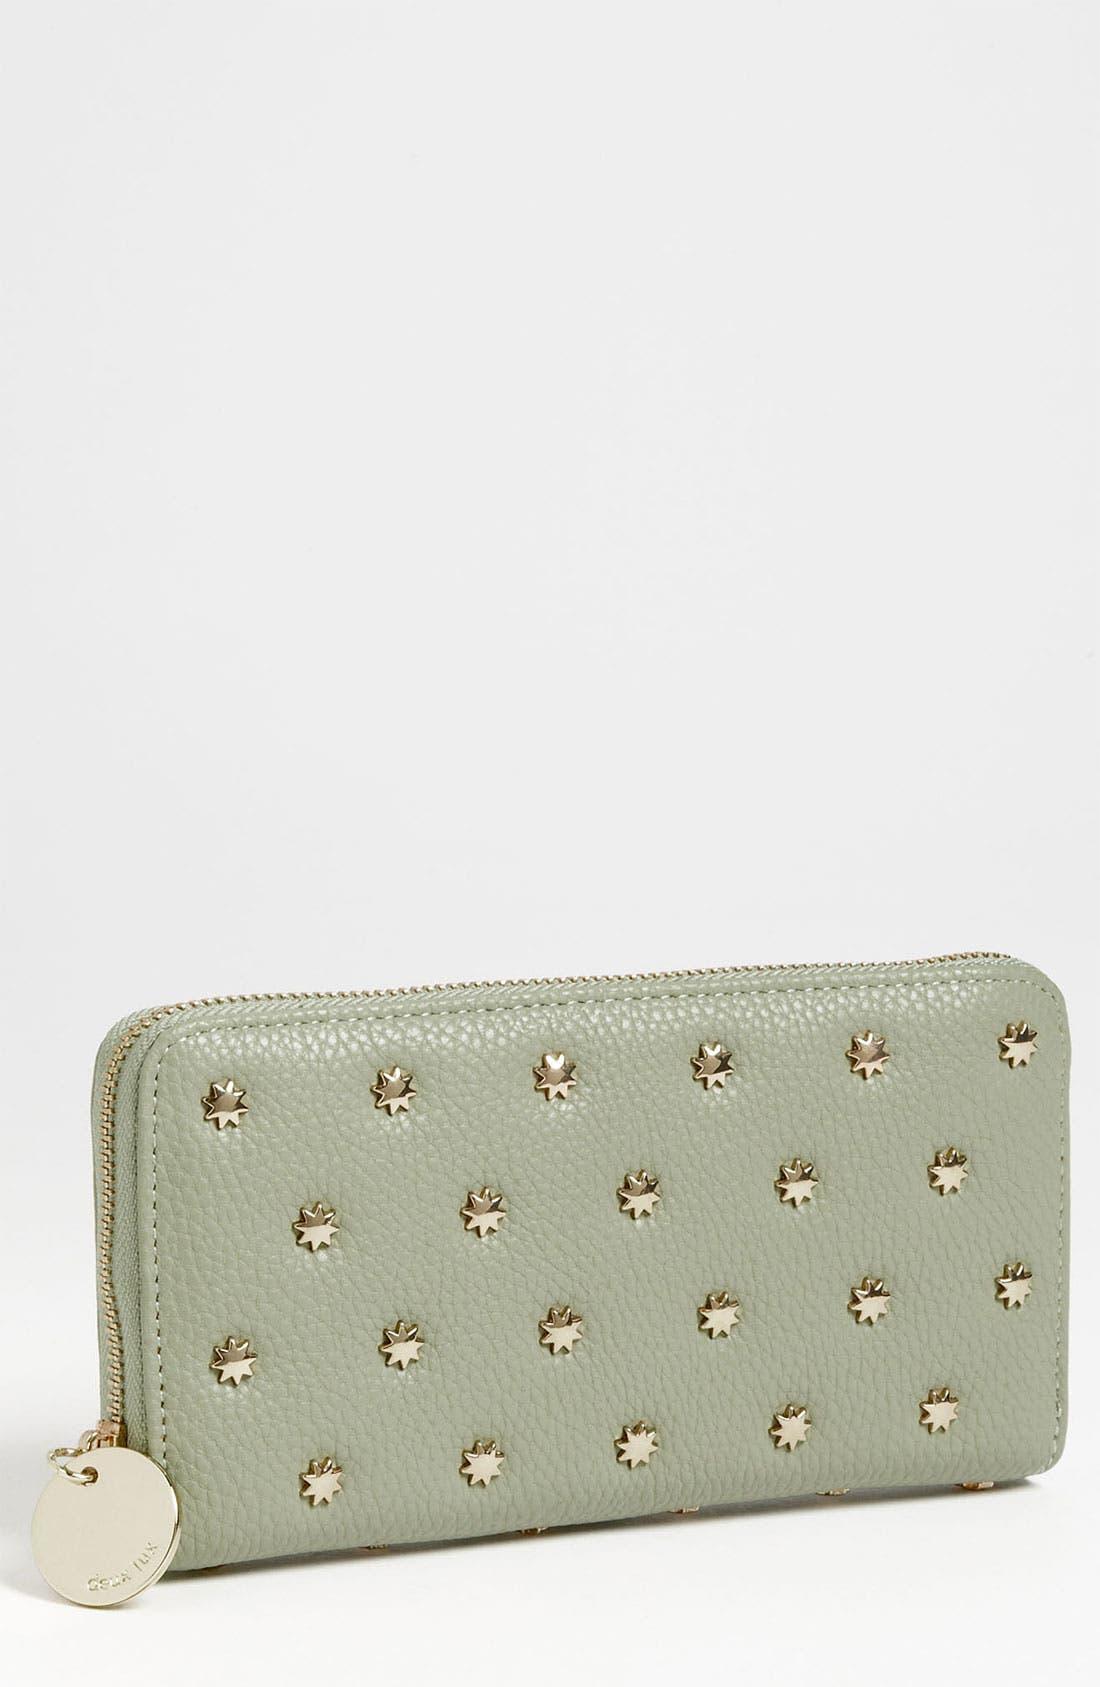 Alternate Image 1 Selected - Deux Lux 'Star Gazer' Wallet